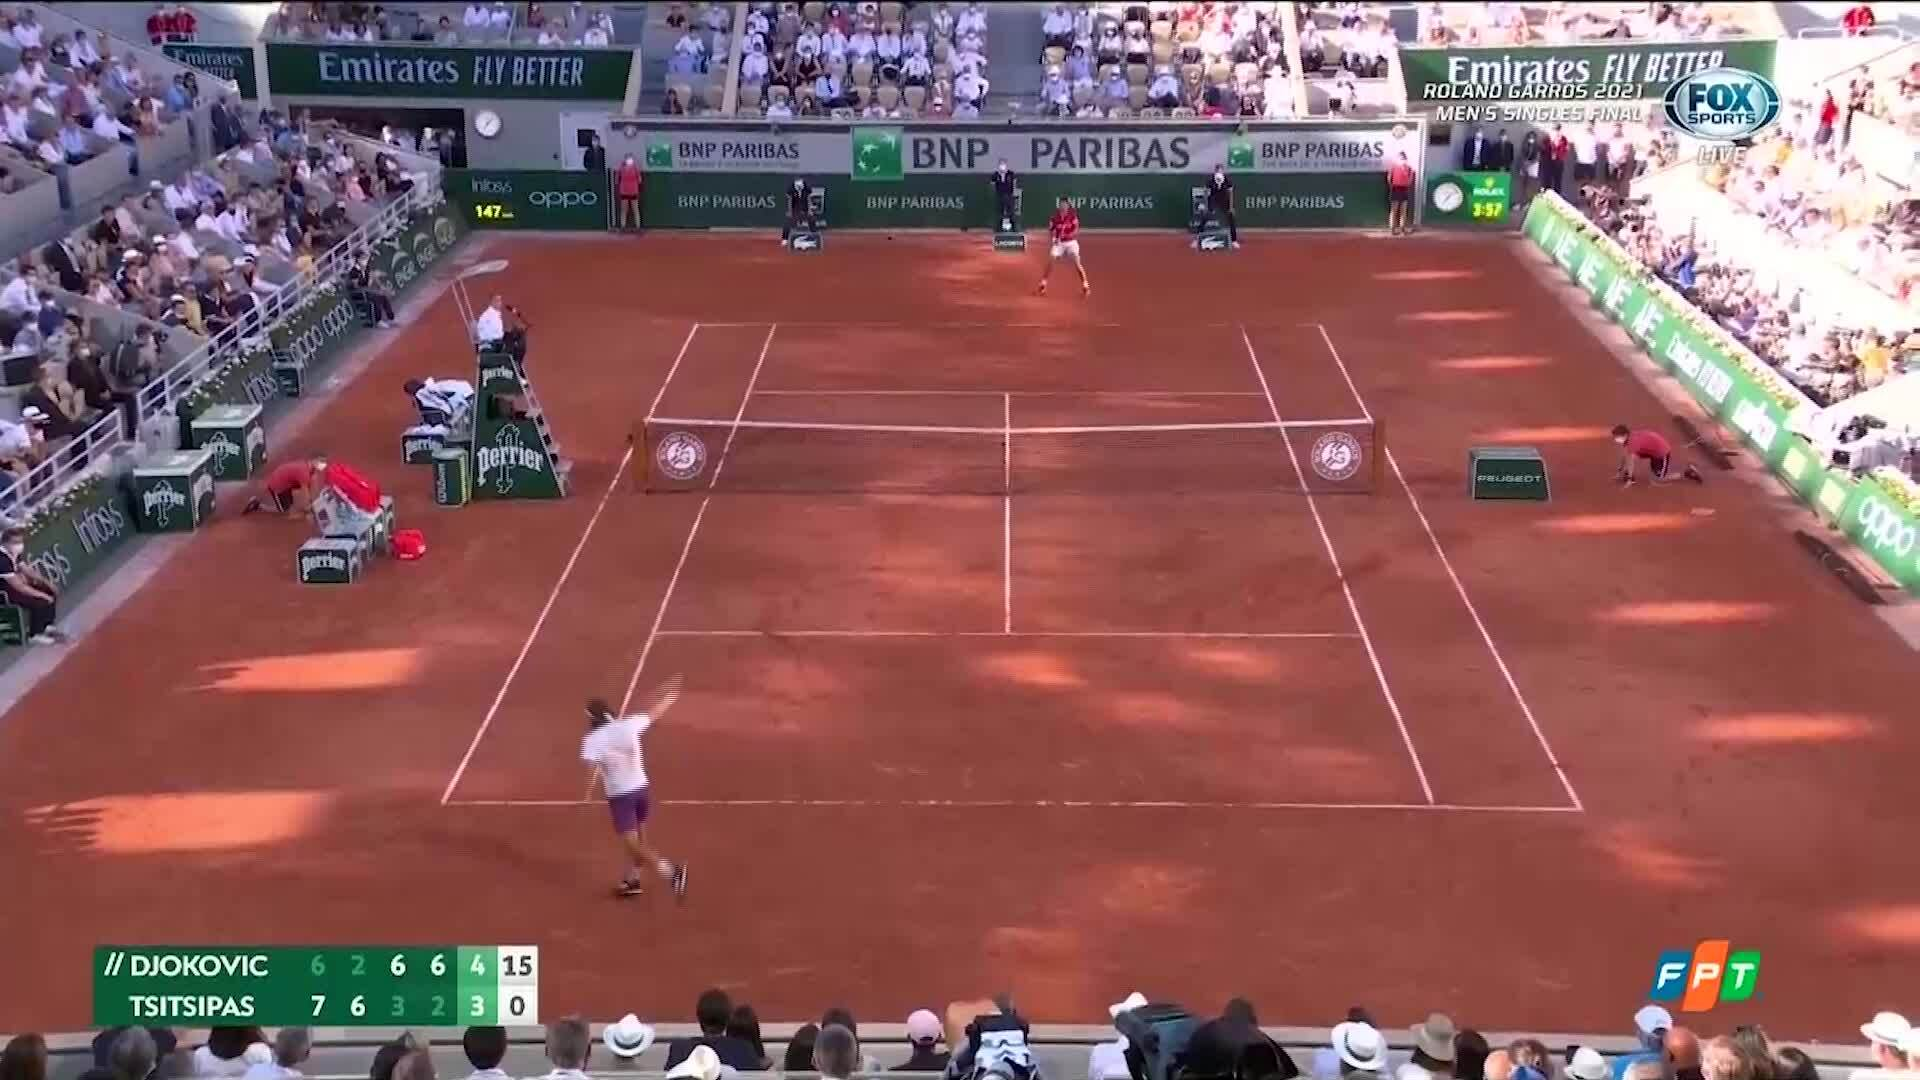 Djokovic thắng Tsitsipas sau năm set